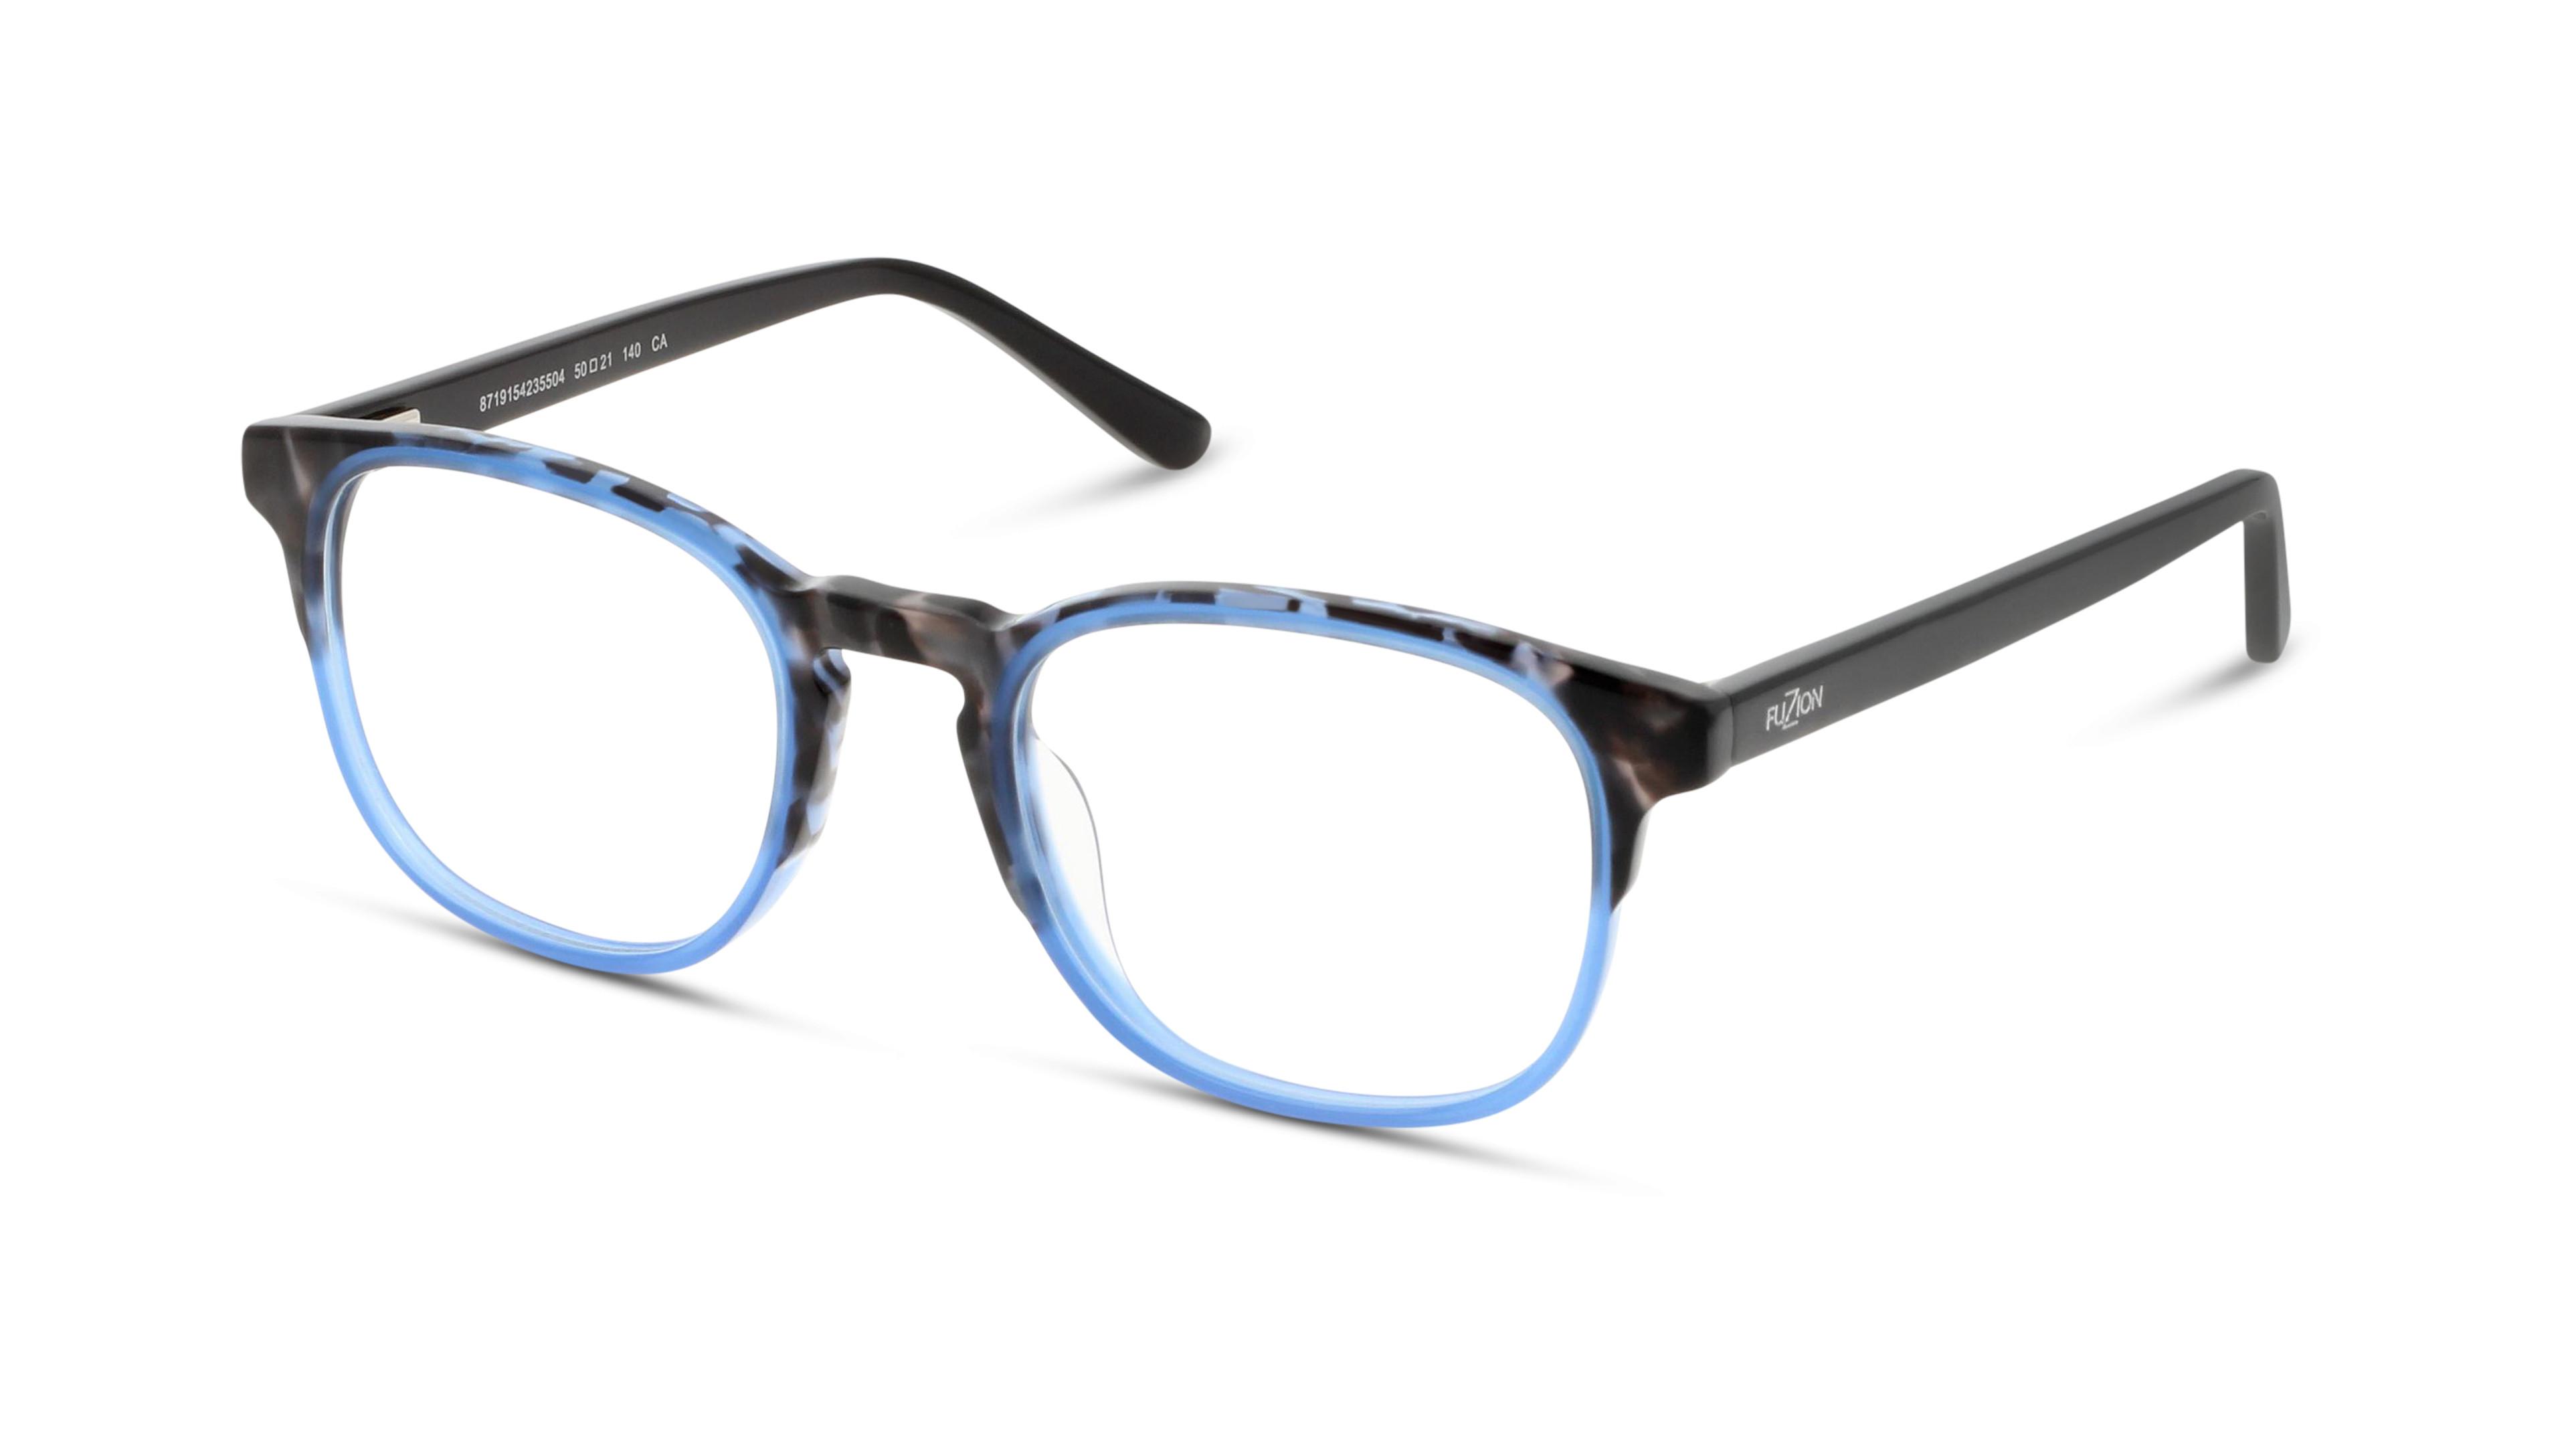 8719154621260-angle-01-fuzion-fufm04-expressionism-black-navy-blue